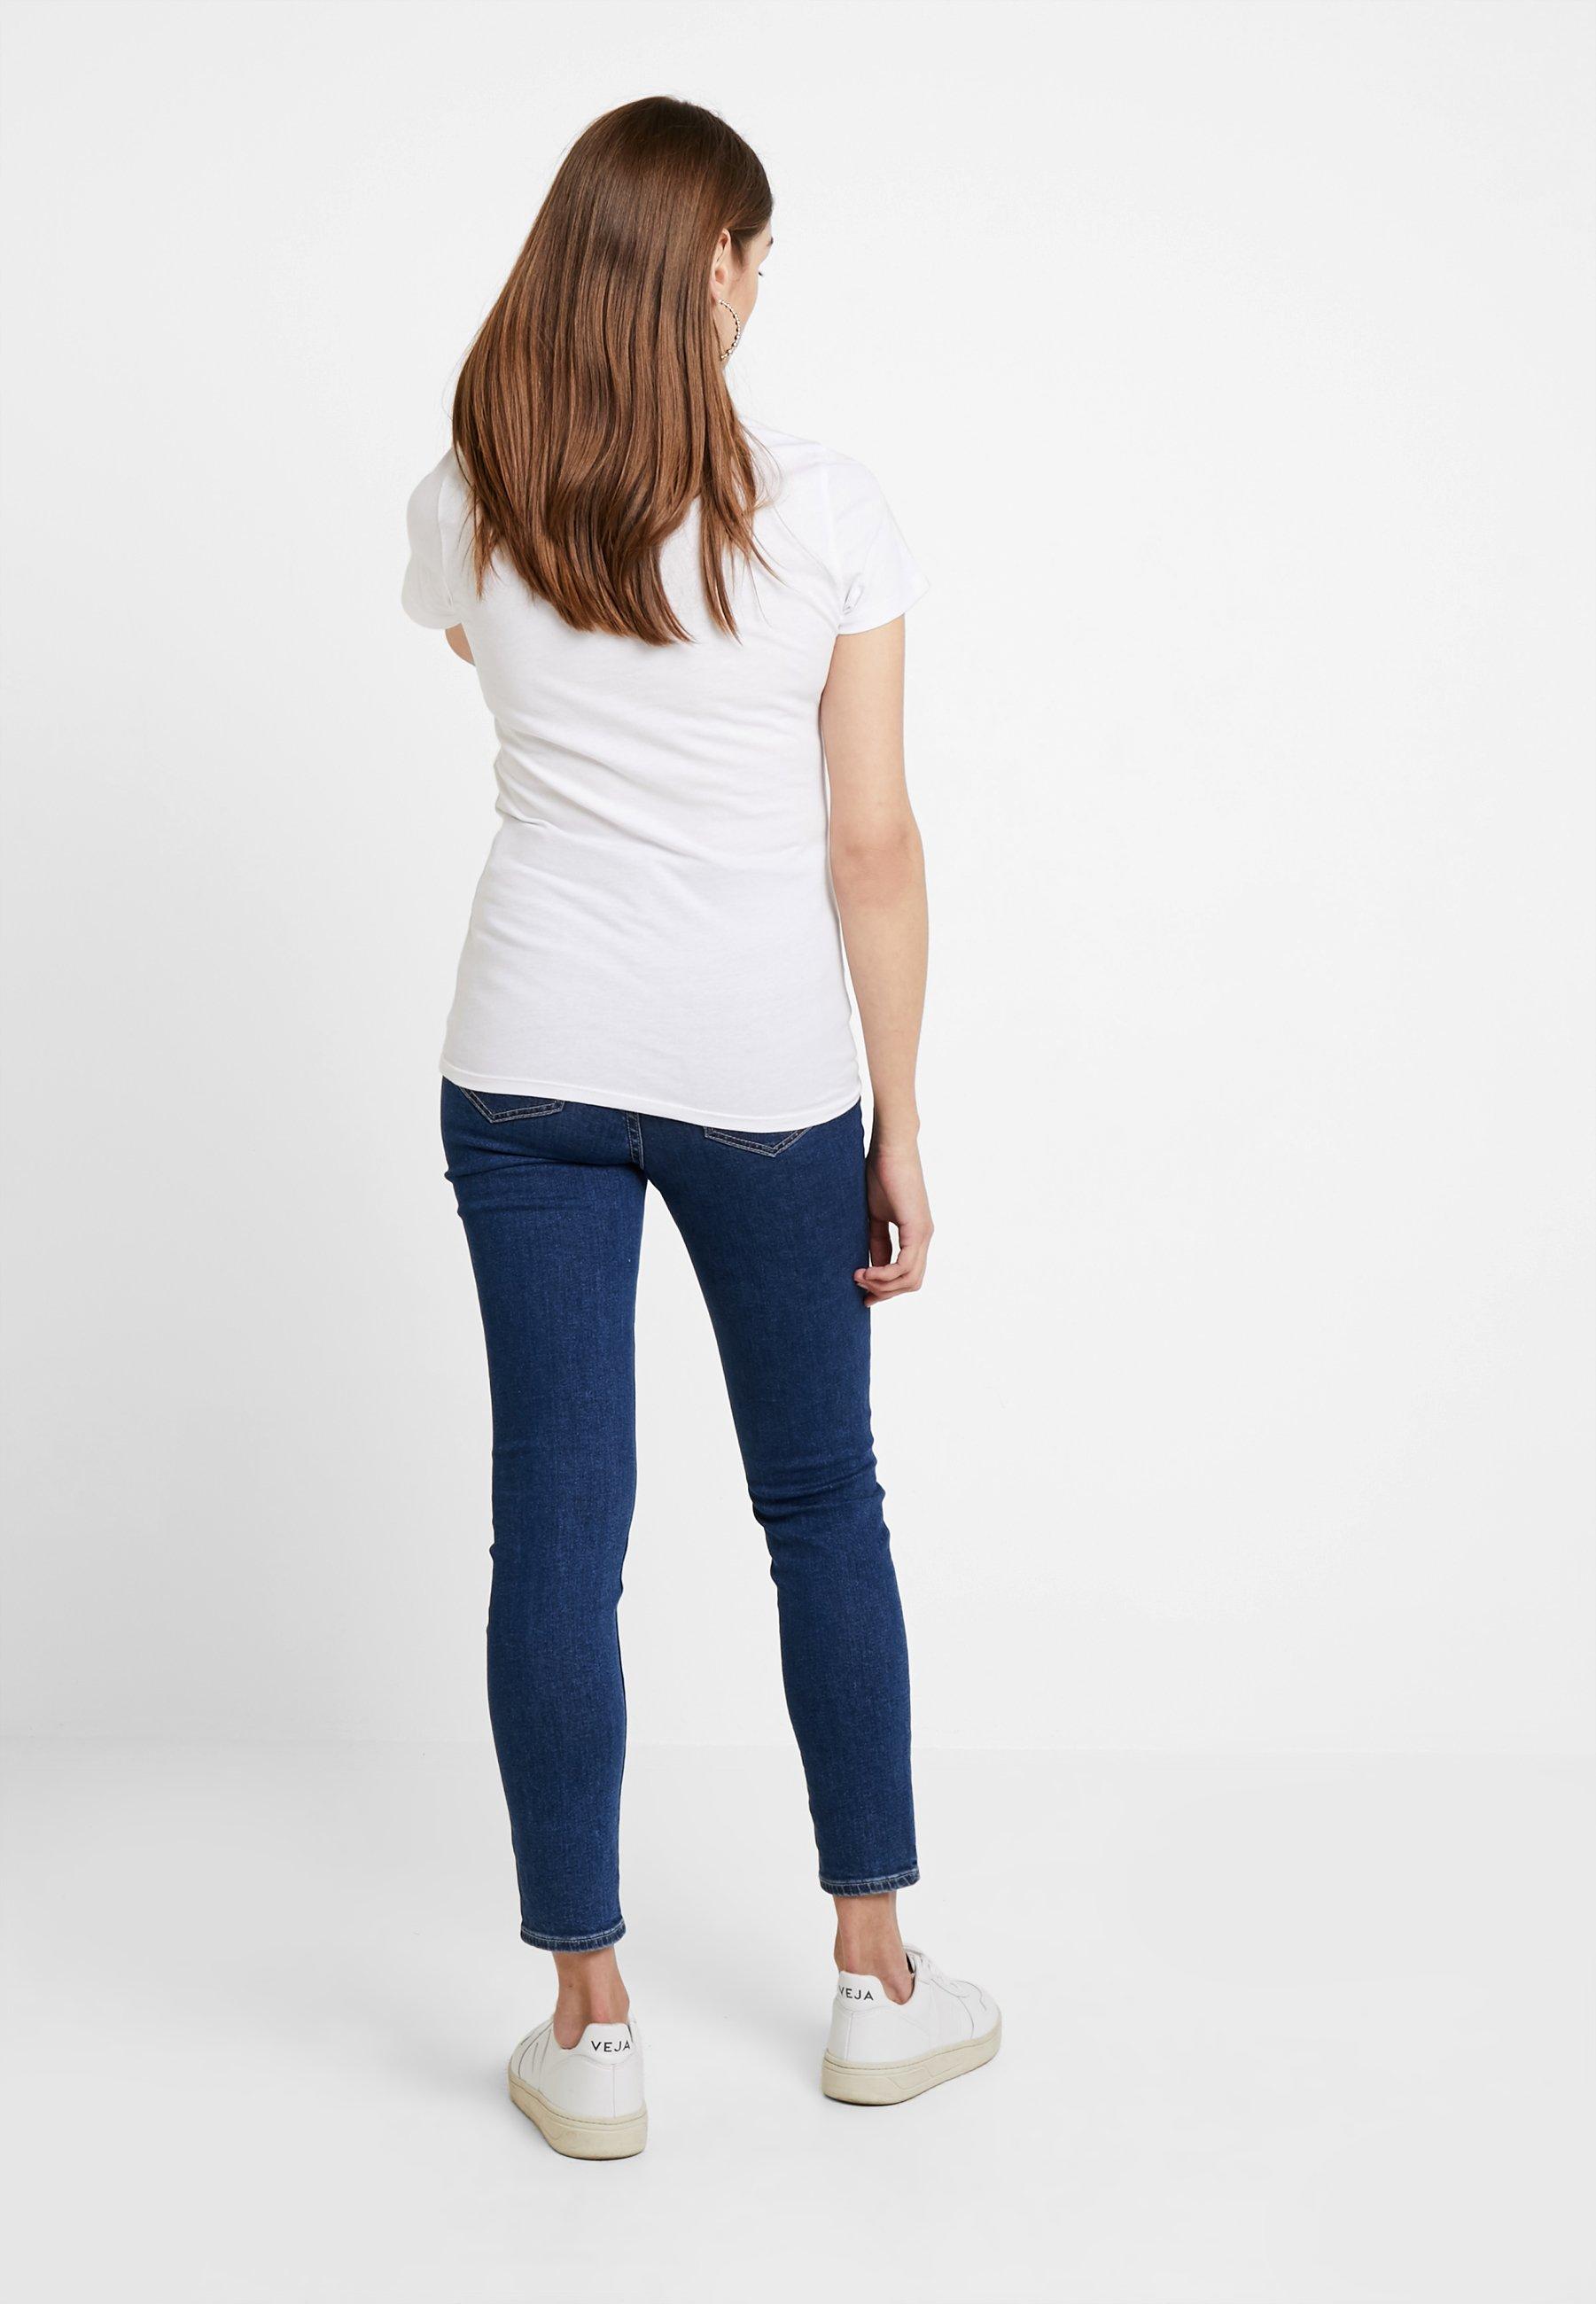 TeeT White Logo Tommy shirt Slim Modern Jeans Basique Classic cLqjS345AR